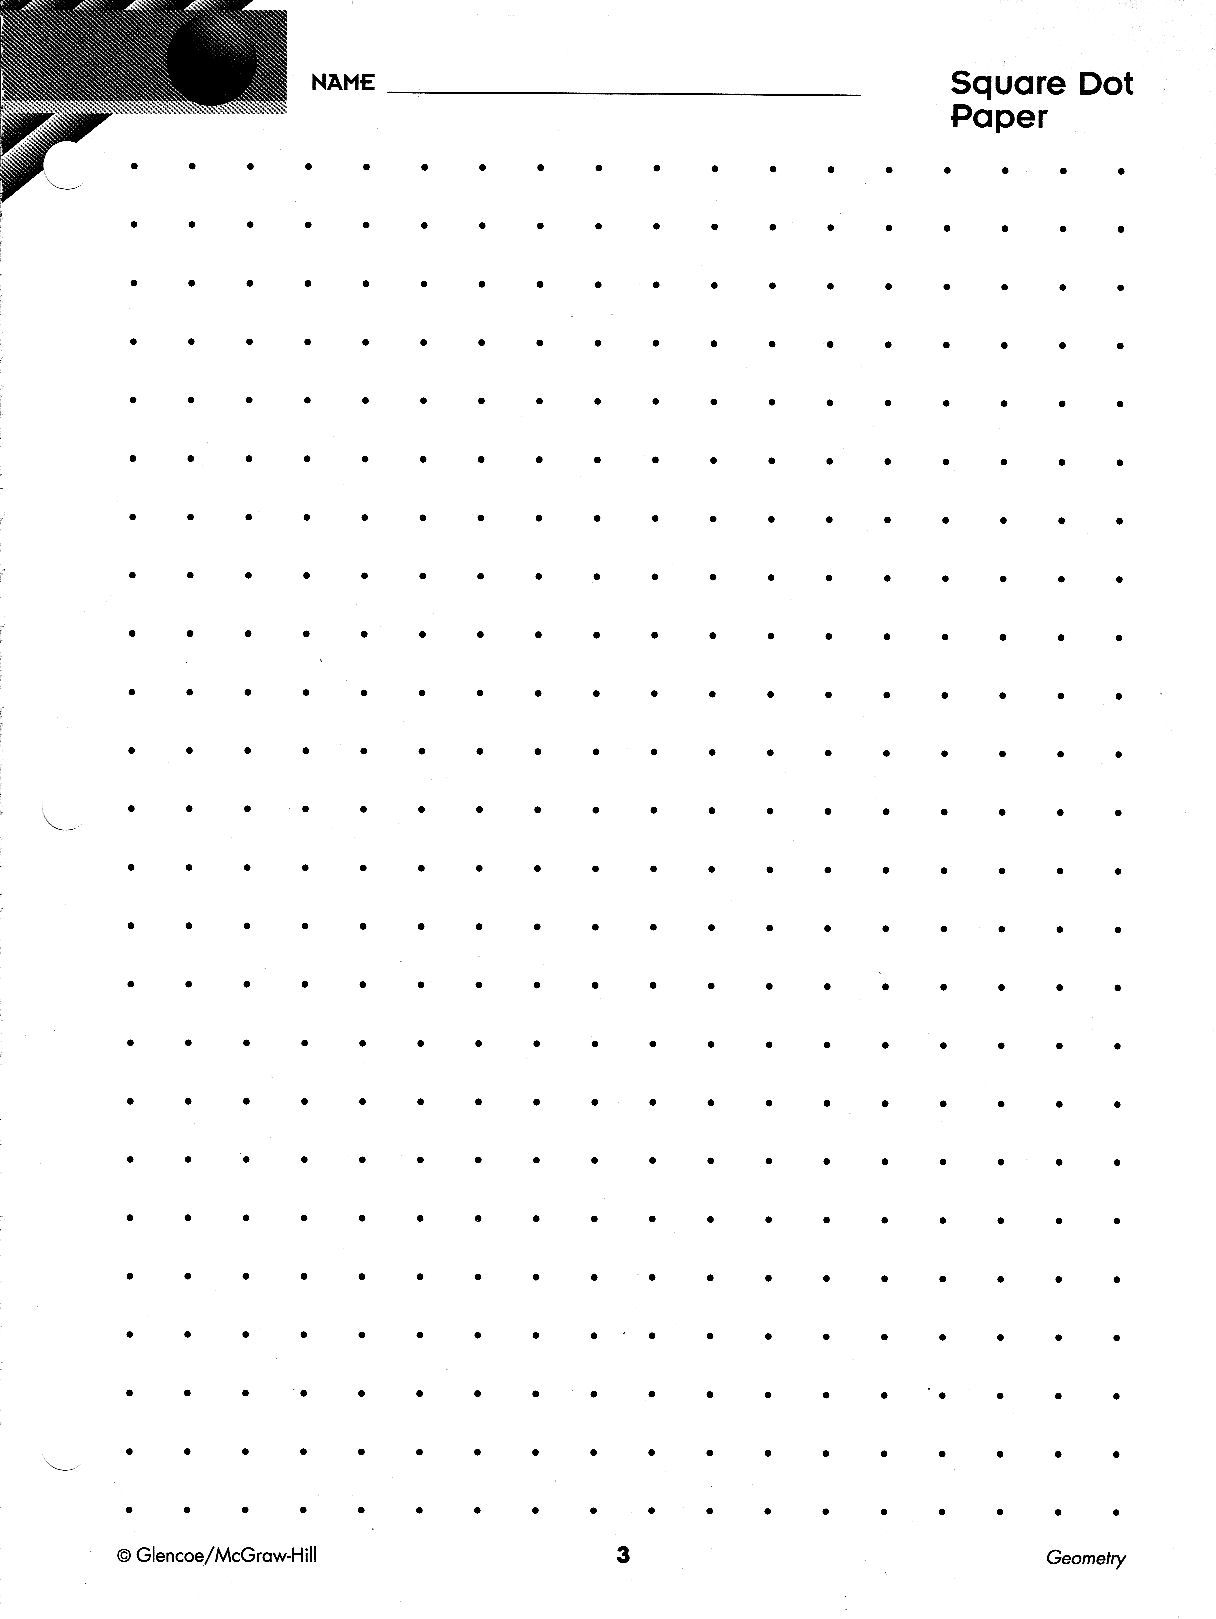 Pindavid Carey On Printables - Only Free Printables | Pinterest - Free Printable Square Dot Paper